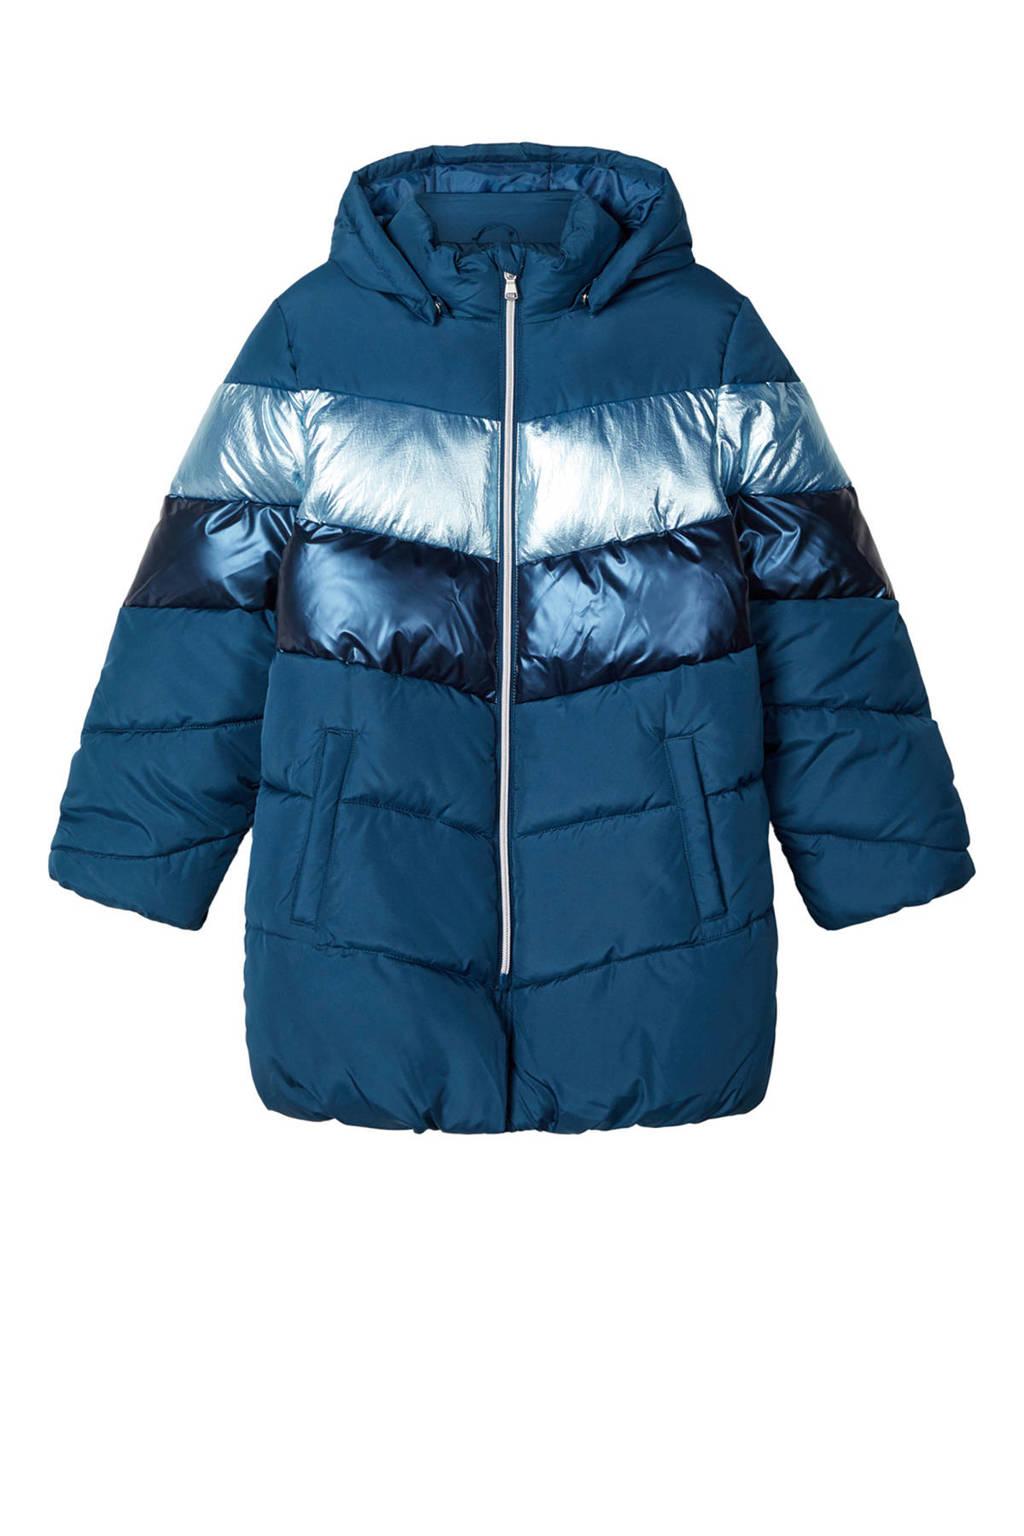 NAME IT KIDS gewatteerde winterjas Madeleine blauw, Blauw